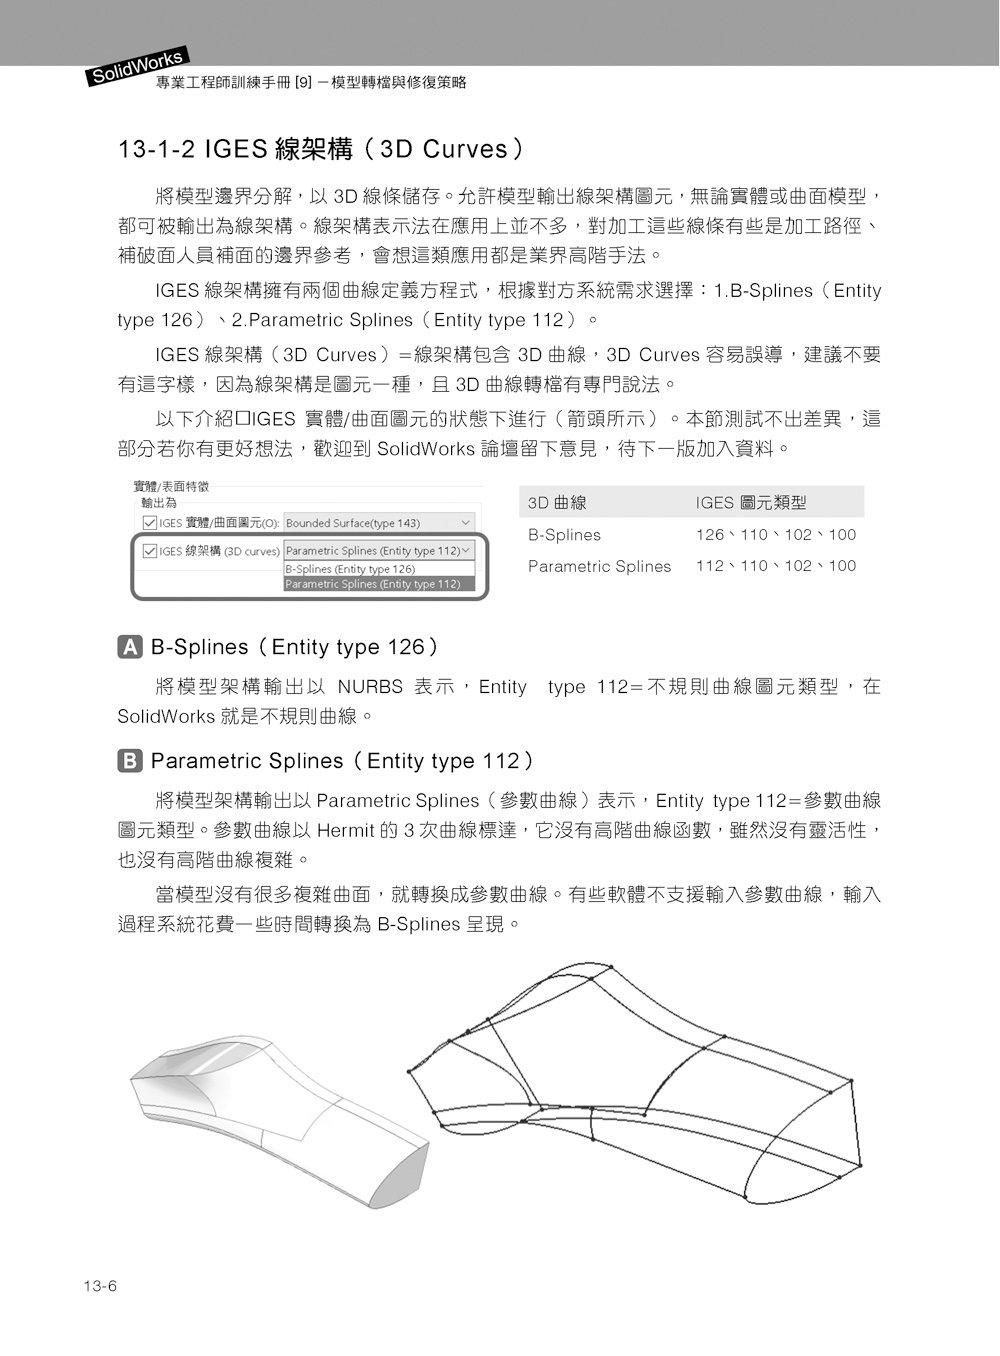 Solidworks 專業工程師訓練手冊[9]-模型轉檔與修復策略-preview-19